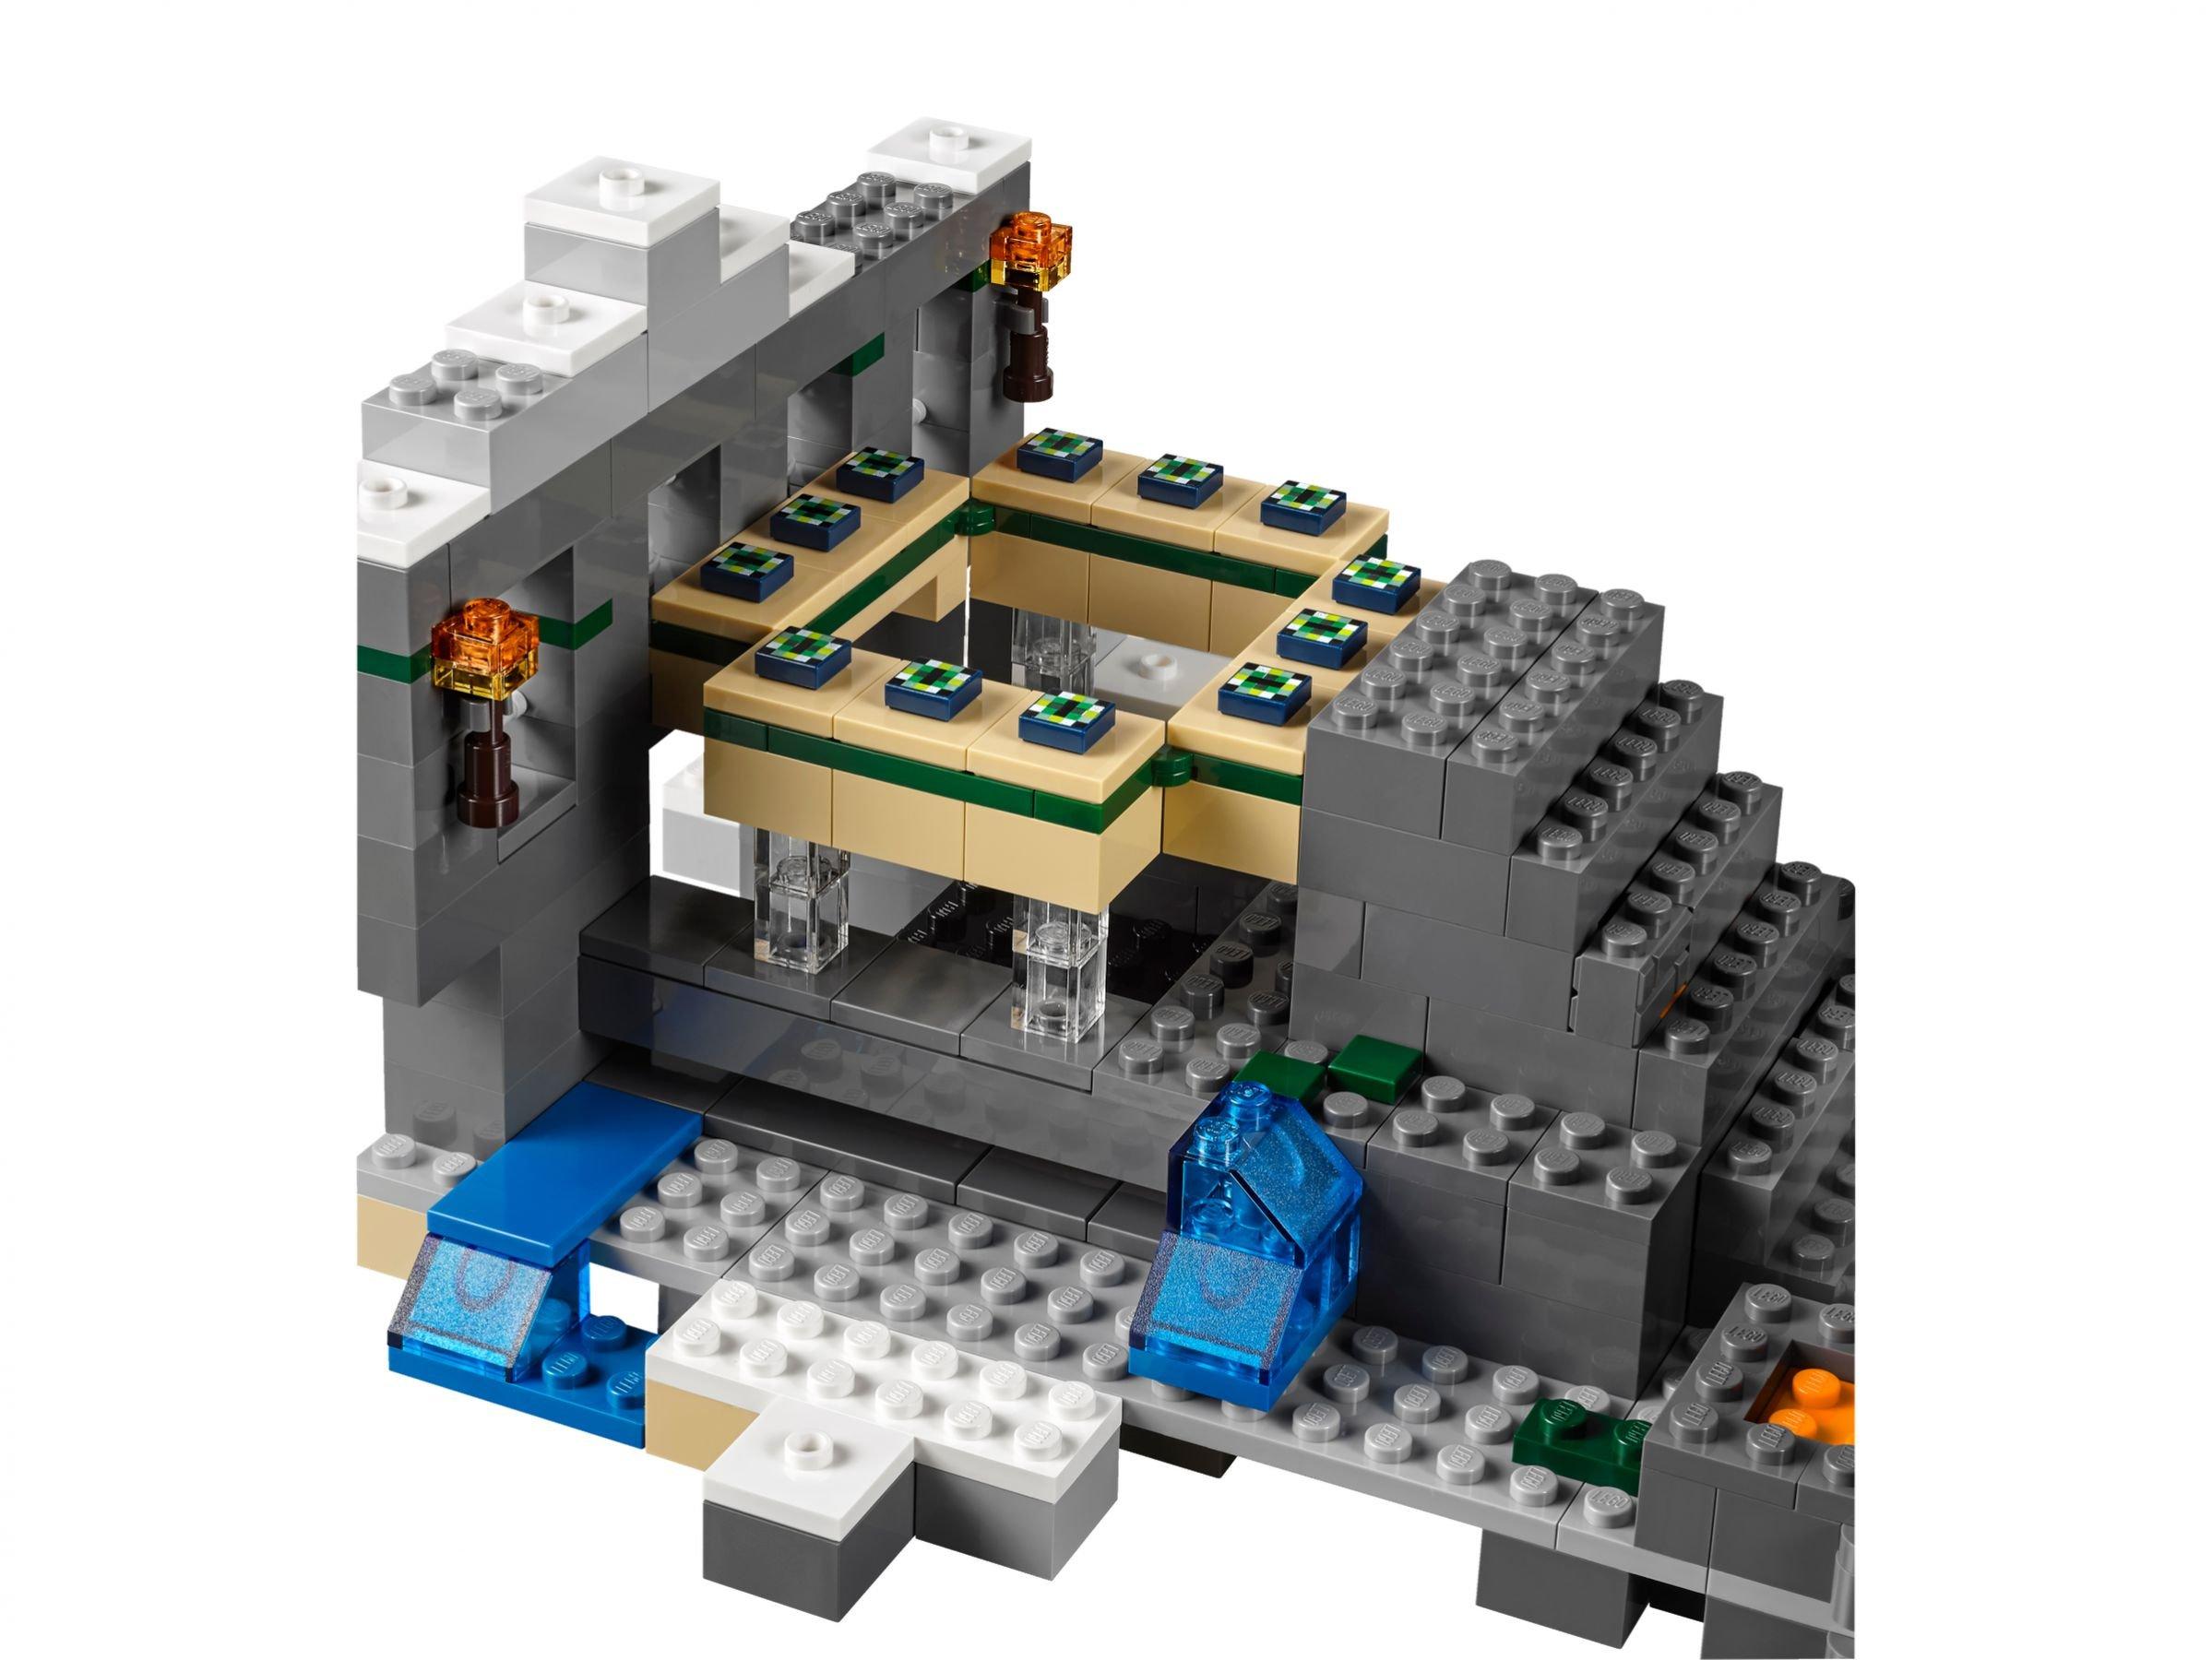 lego 21124 das end portal minecraft 2016 the end portal brickmerge. Black Bedroom Furniture Sets. Home Design Ideas